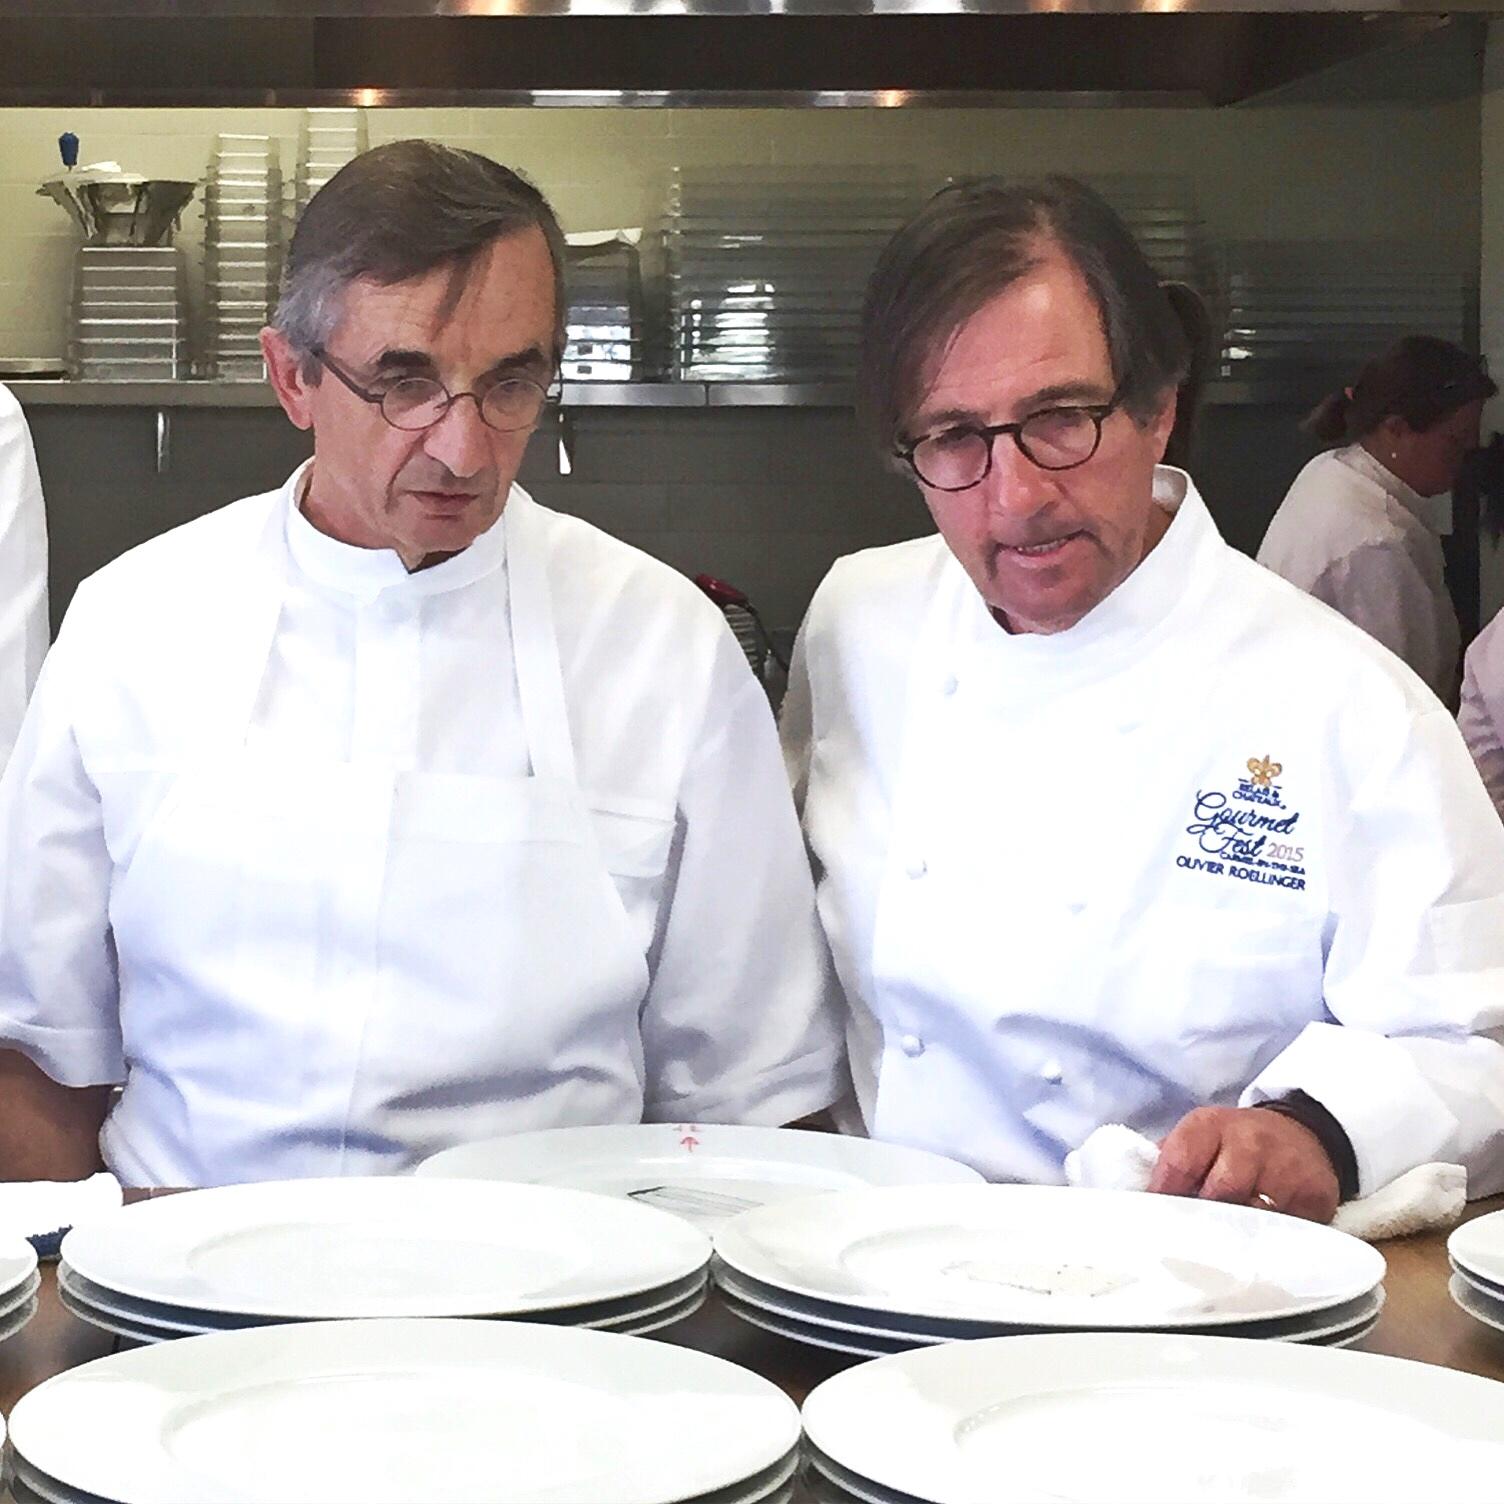 Chefs Michel Bras Olivier Roellinger Relais Chateaux GourmetFest